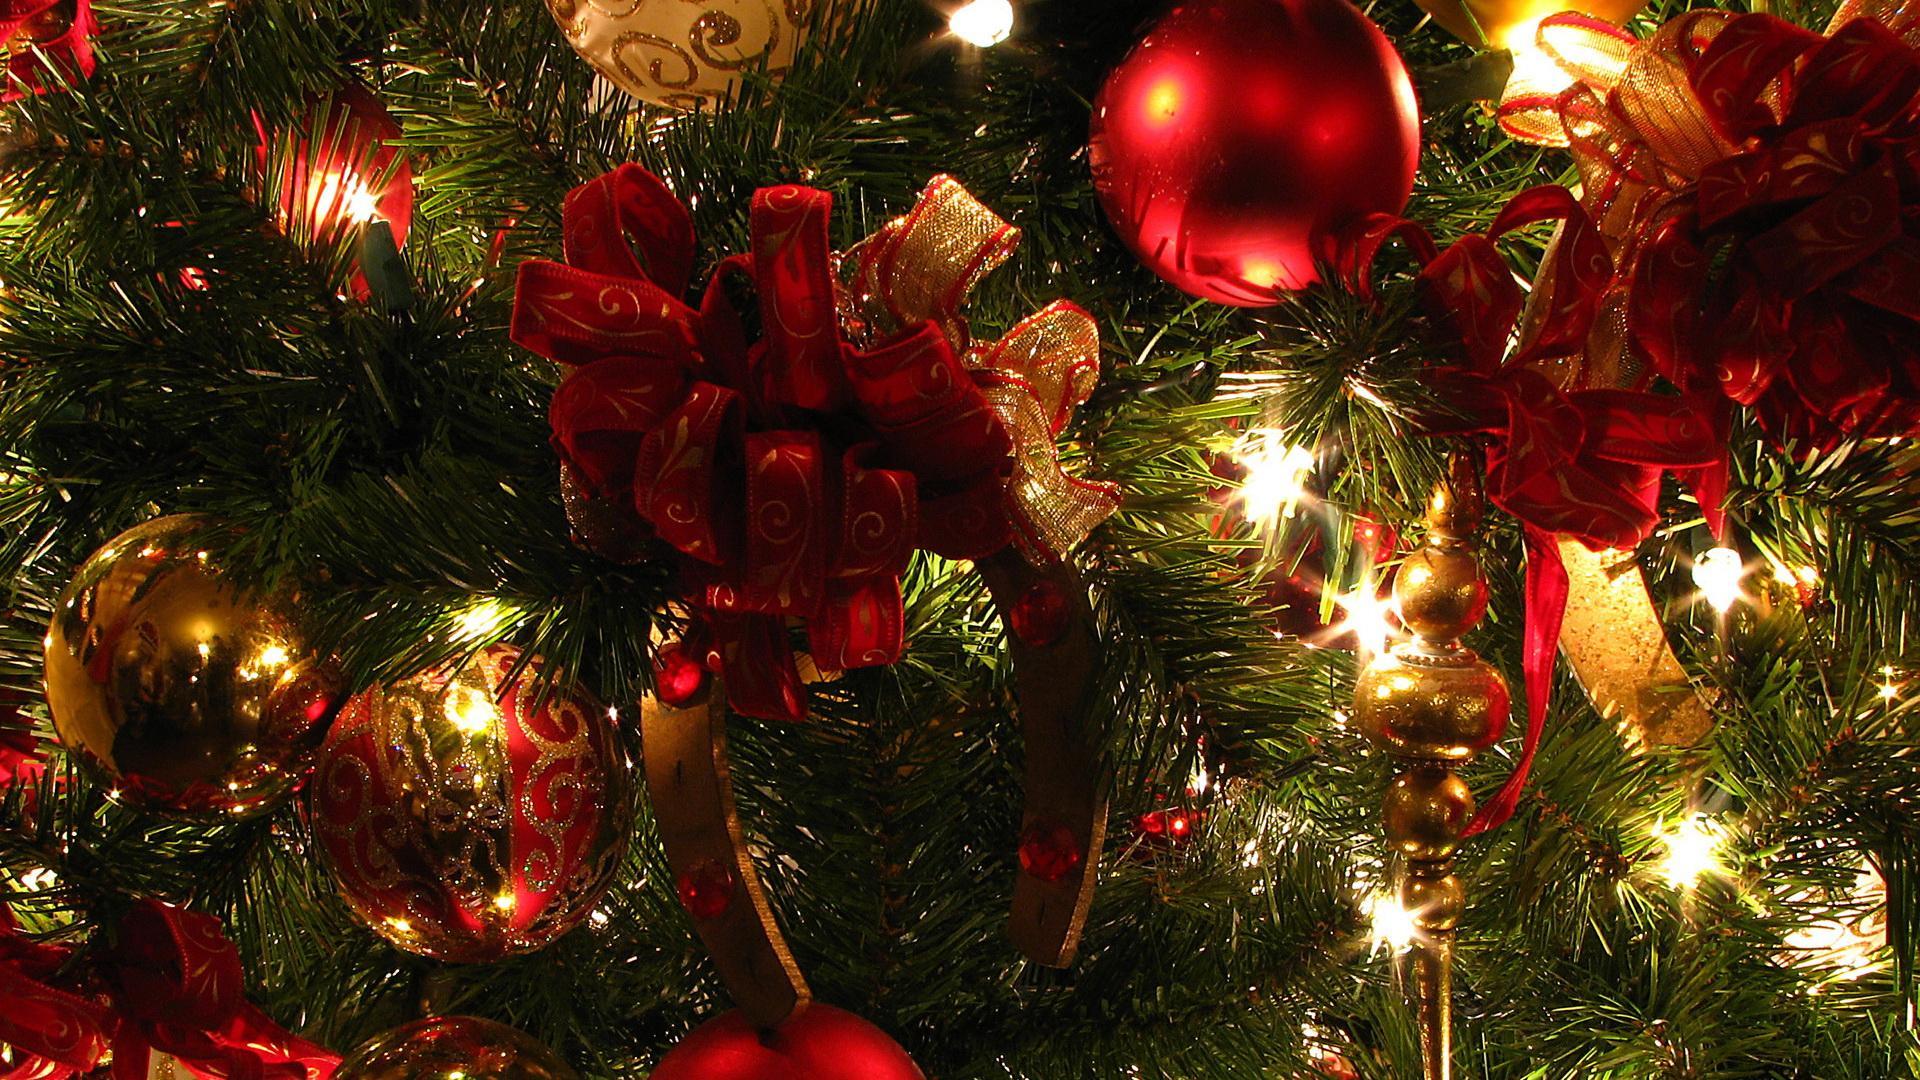 Fondos Navidad De Pantalla Gratis Fondos De Pantalla